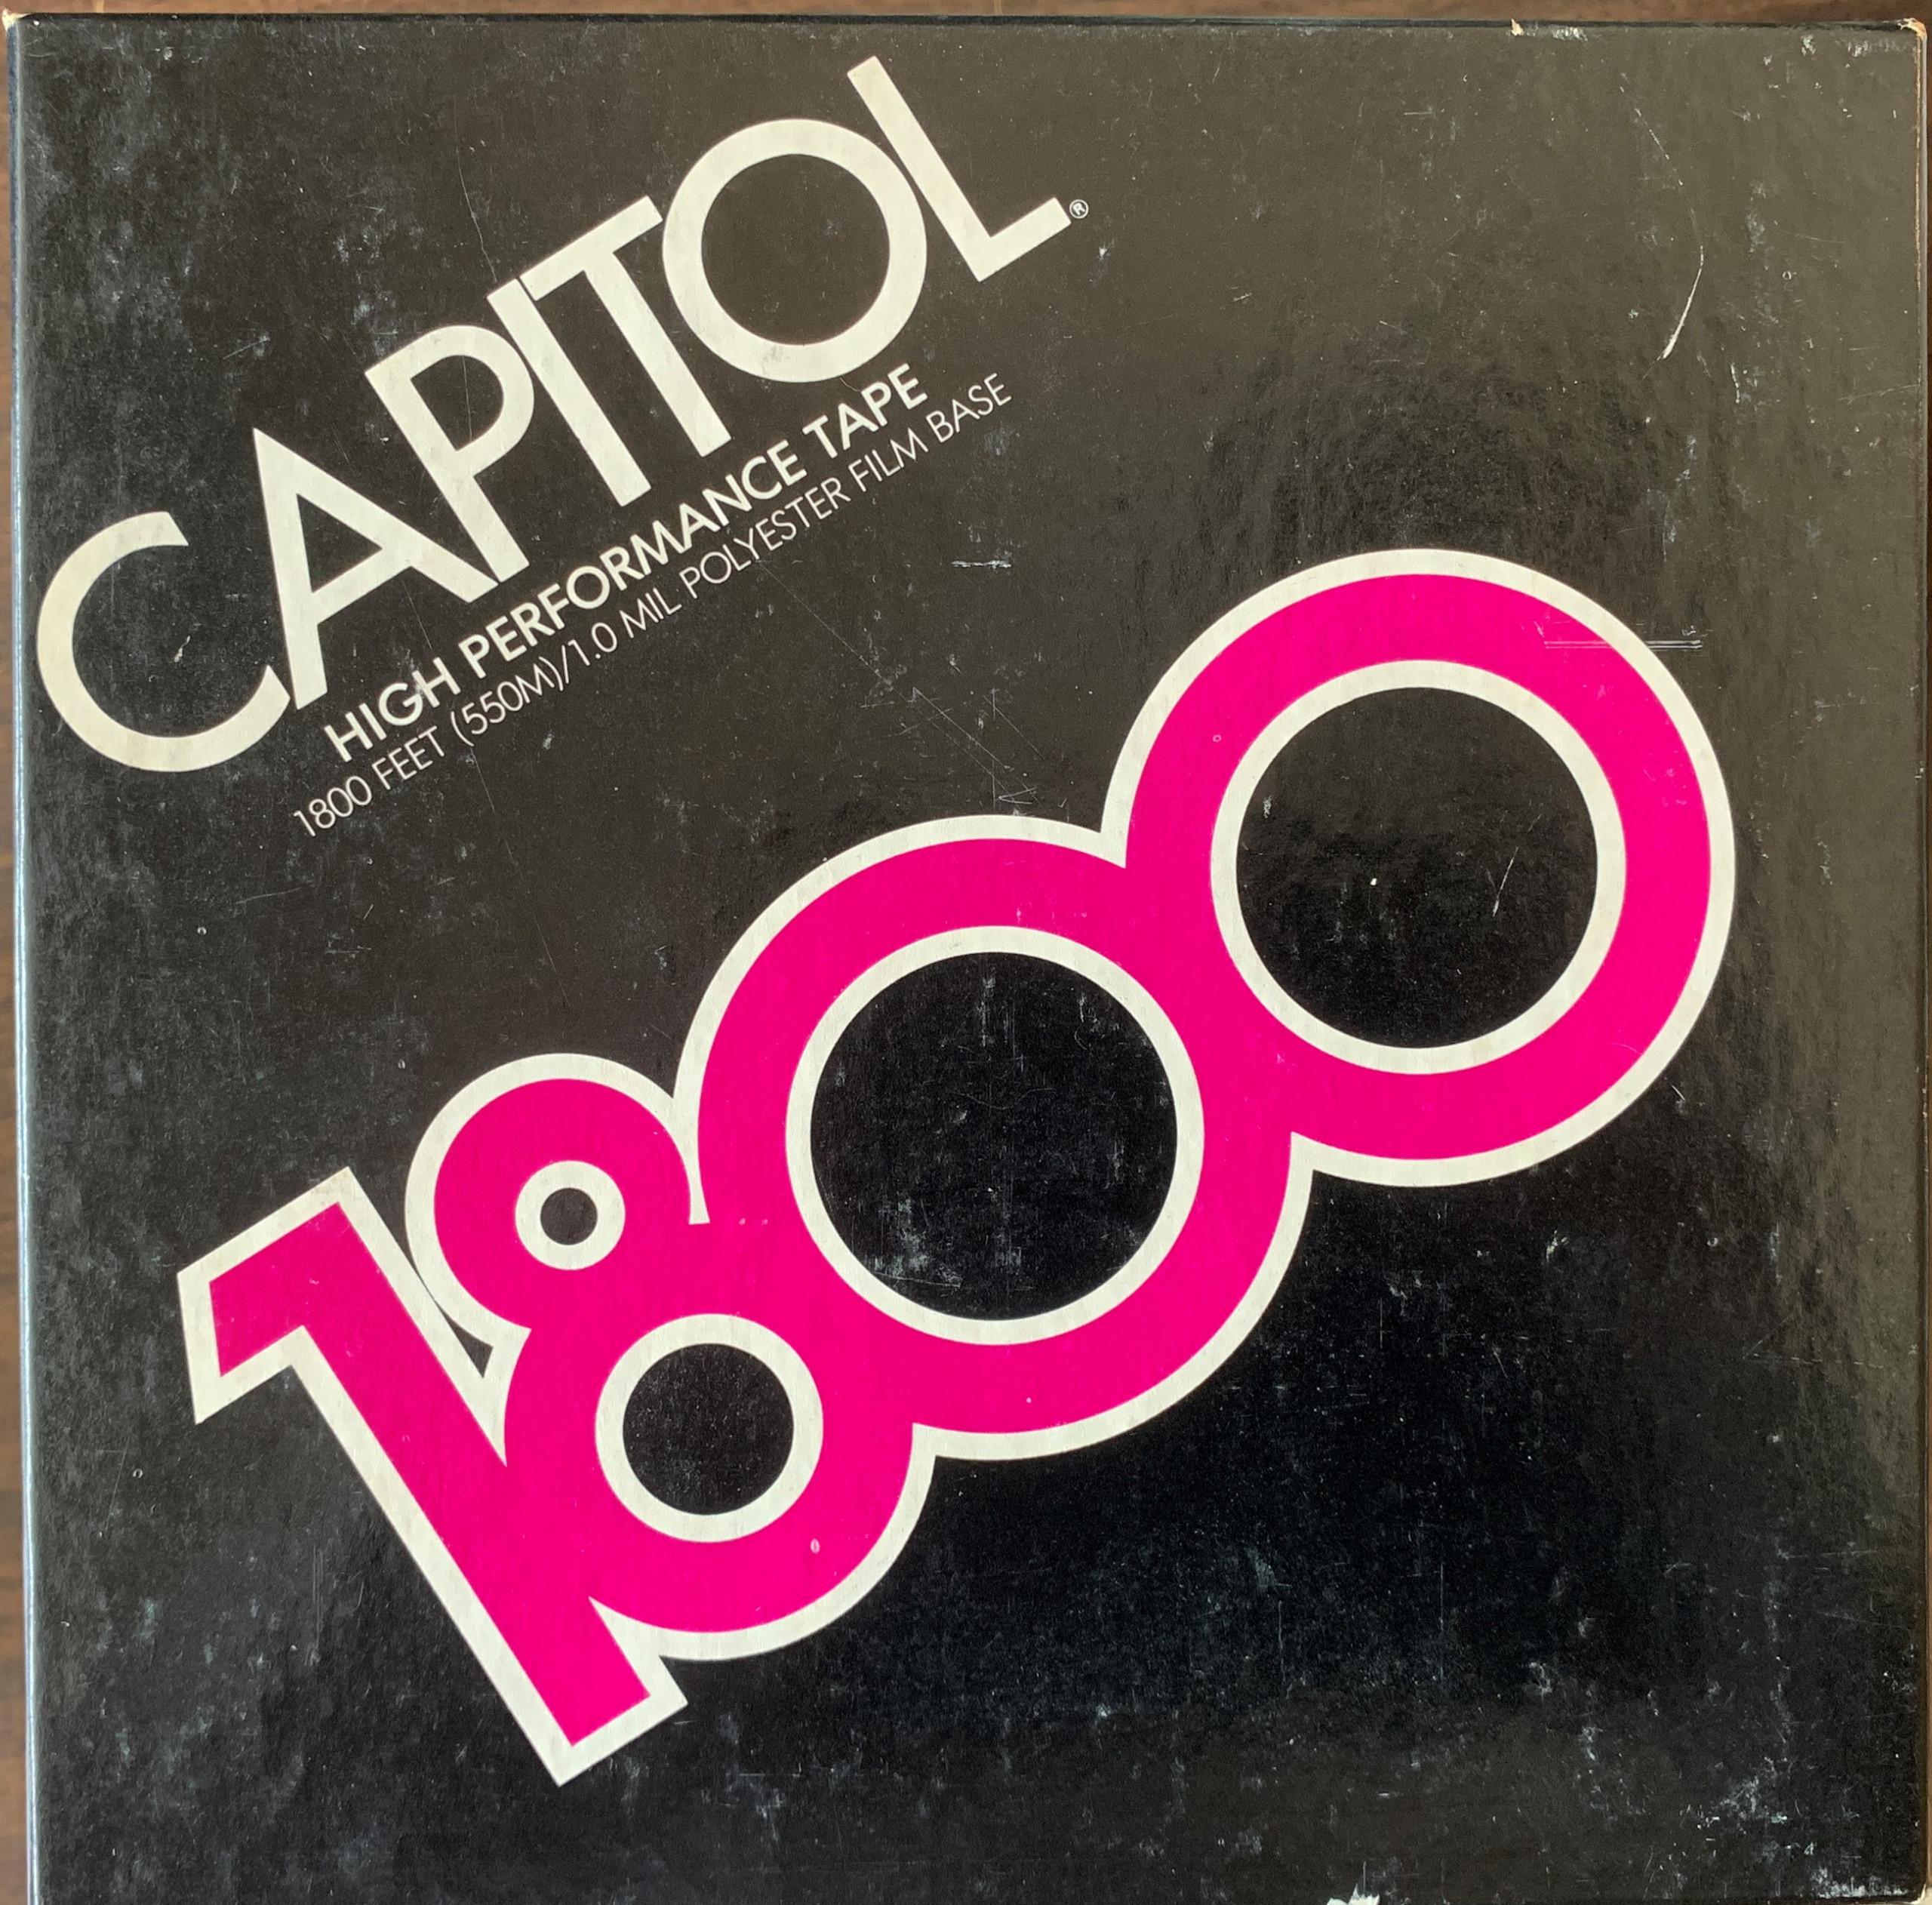 Capitol-Audiotape-HP-1800-7-in-Reel-Tape-Box